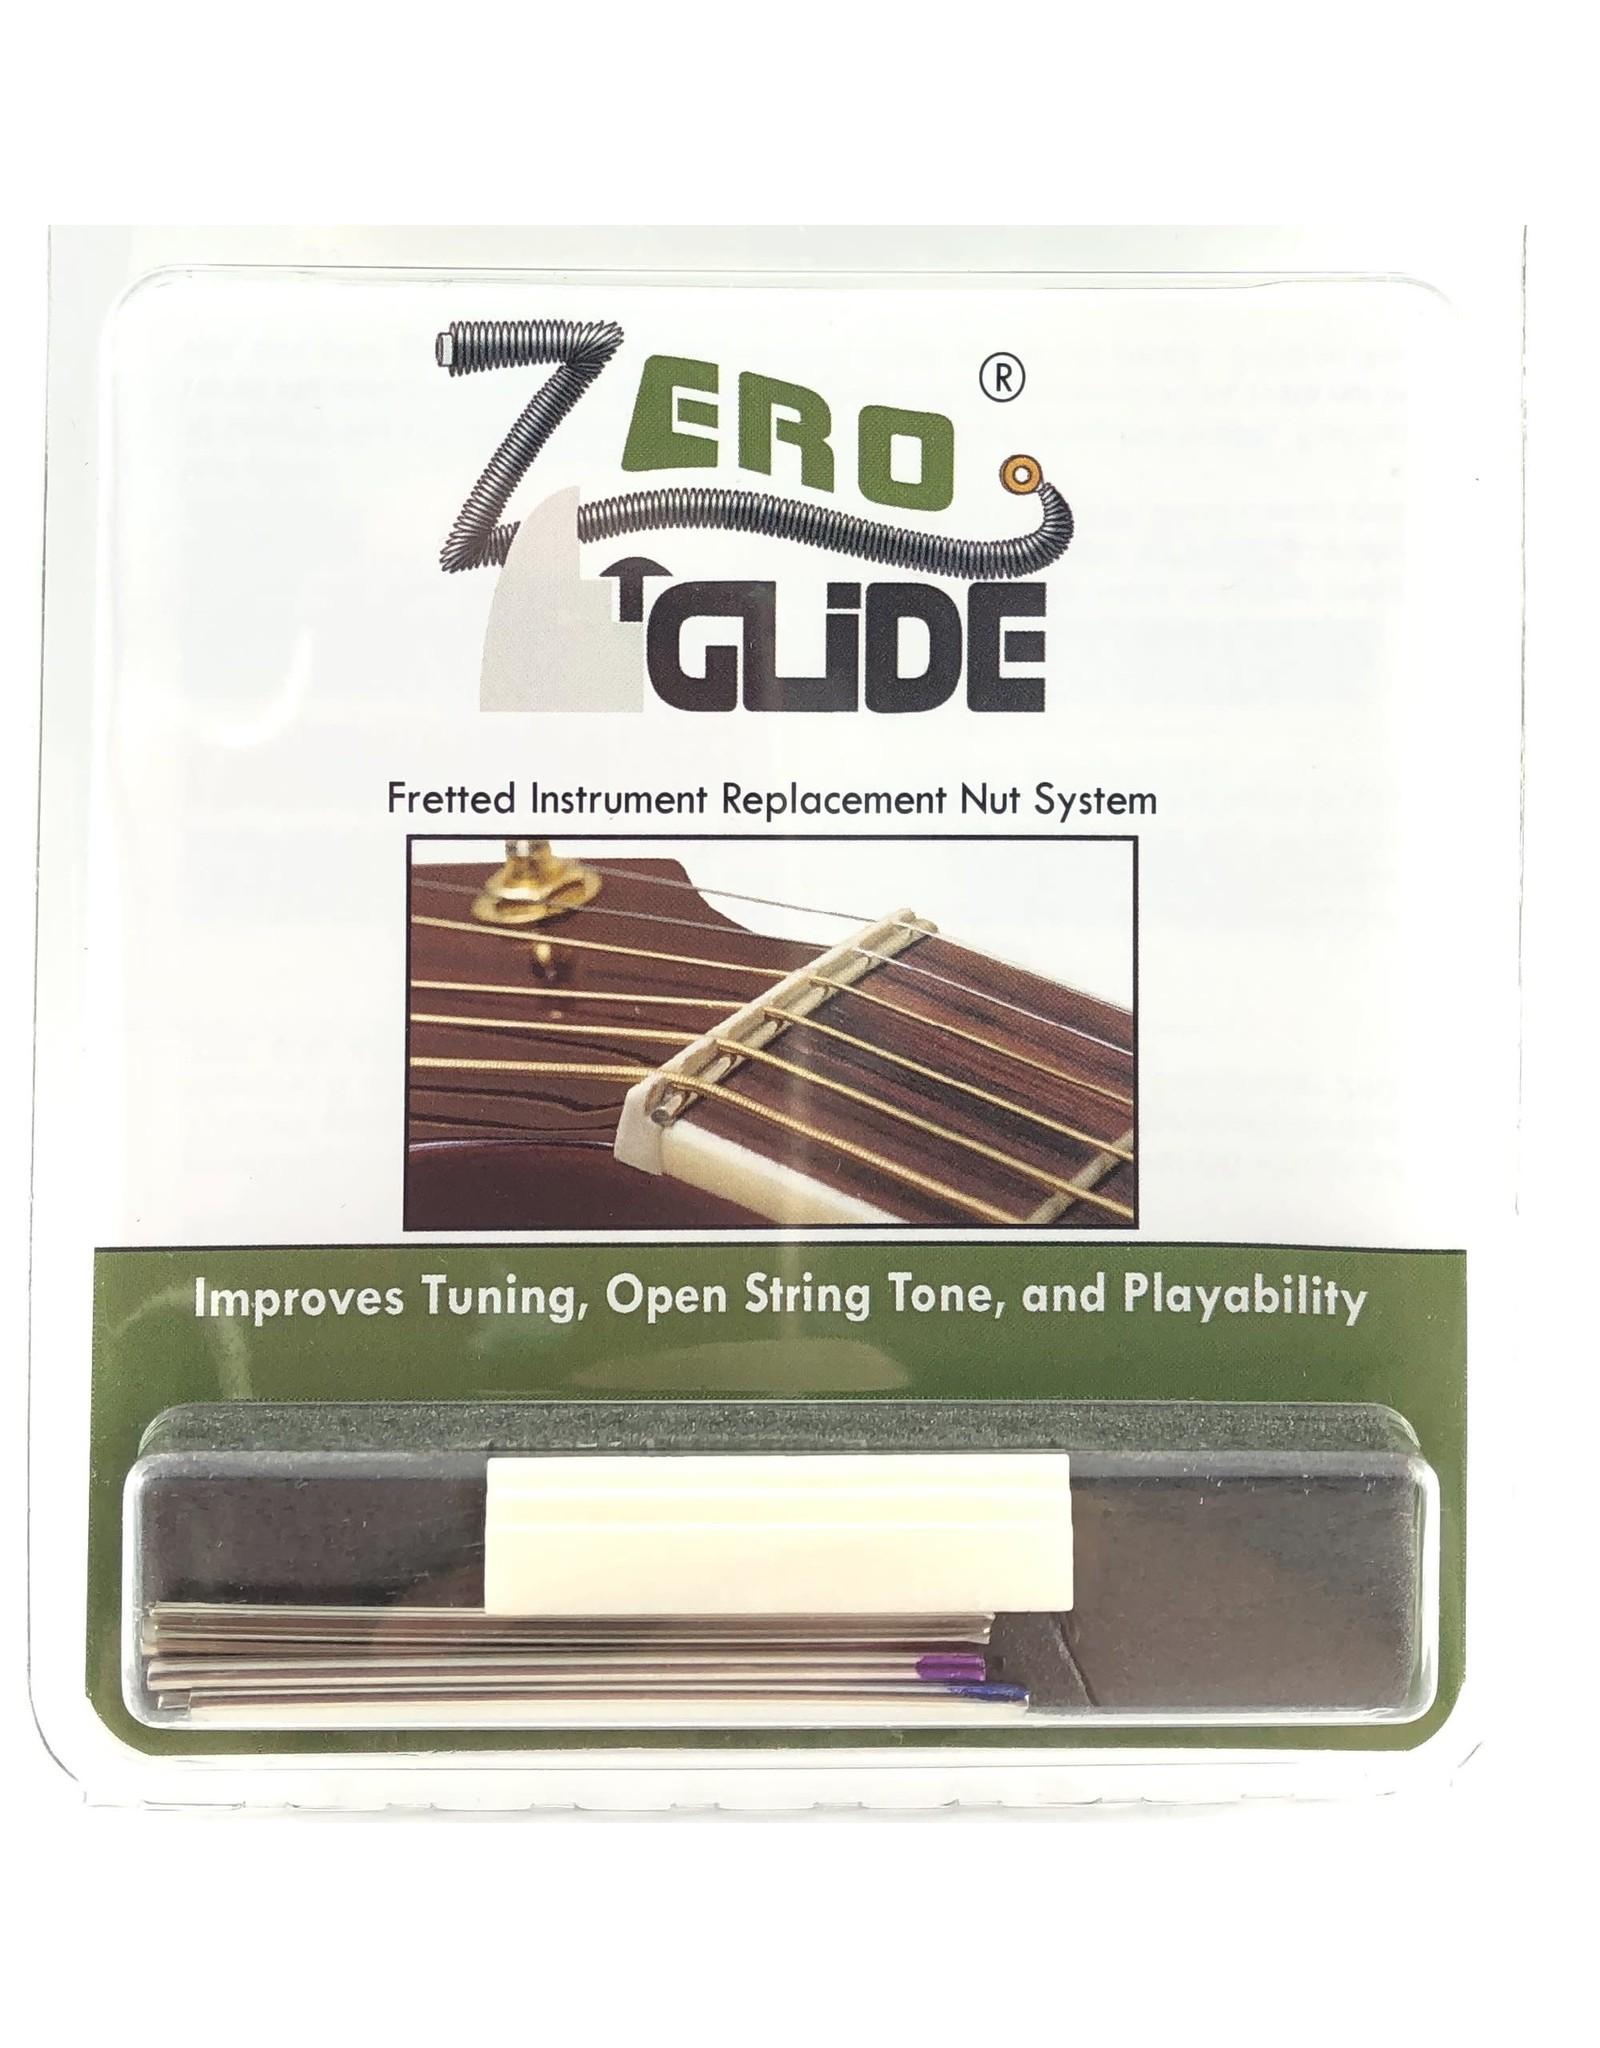 Zero Glide Zero Glide ZB-9 Replacement Unslotted Nut System For Banjo/Mandolin